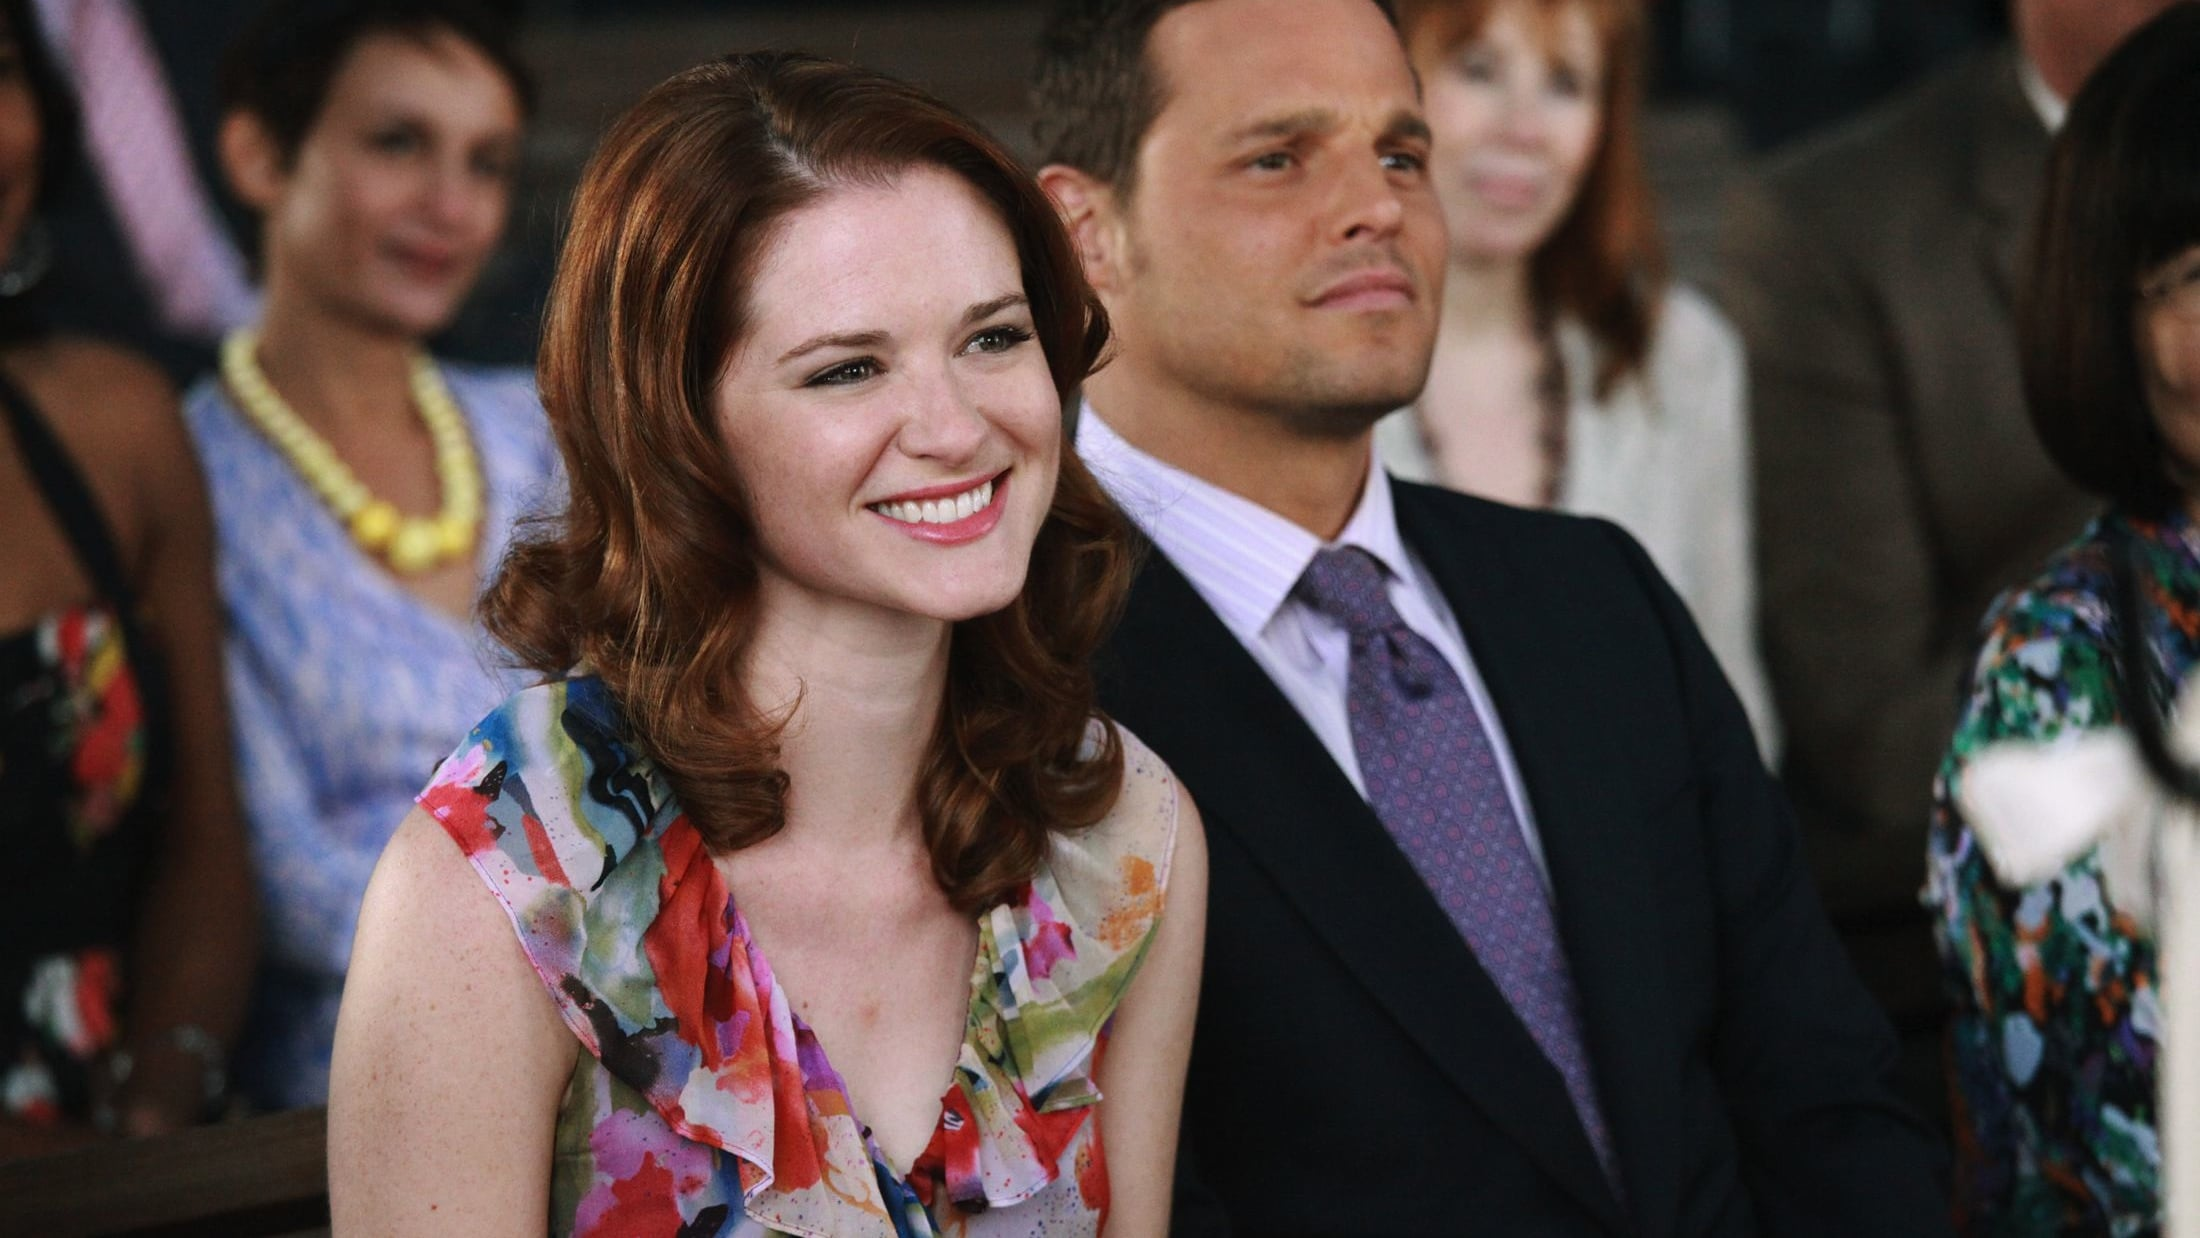 Greys Anatomy Season 7 Episode 20 Openload Watch Online Full